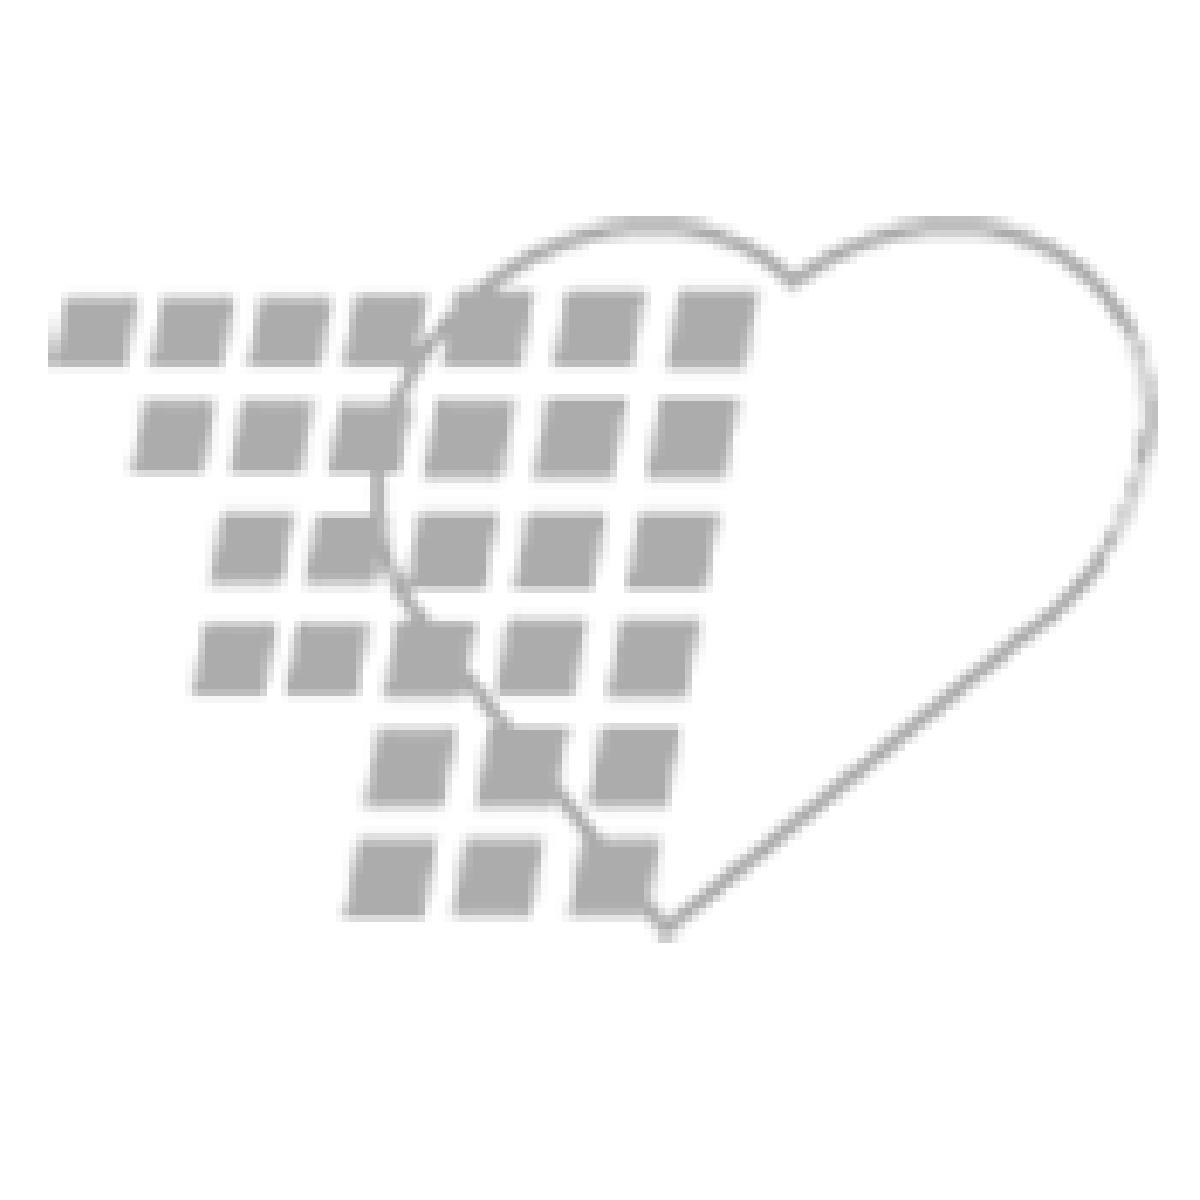 02-38-7098 Bayer Breeze® 2 Blood Glucose Test Strips